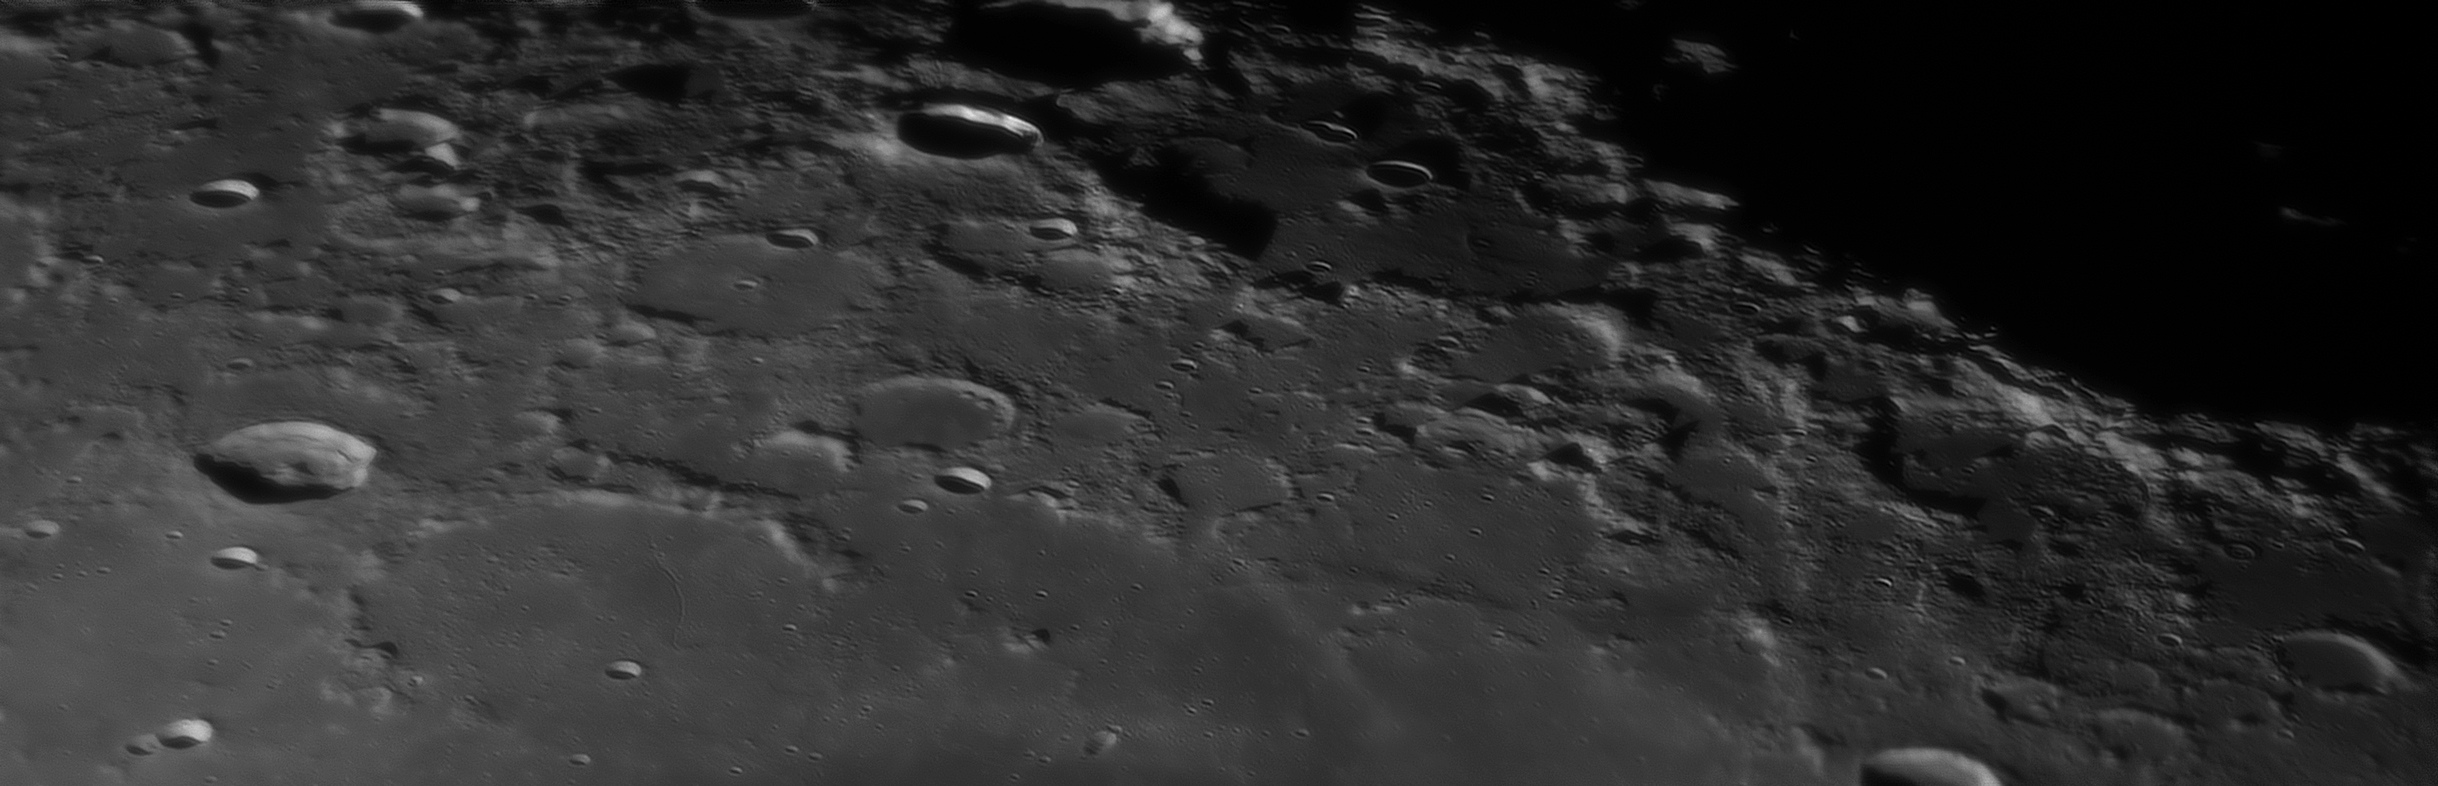 large.moon_17_09_2019_01_09_DE-LA.jpg.7ec3c34f32a0eae8c89b0659a55f1d44.jpg